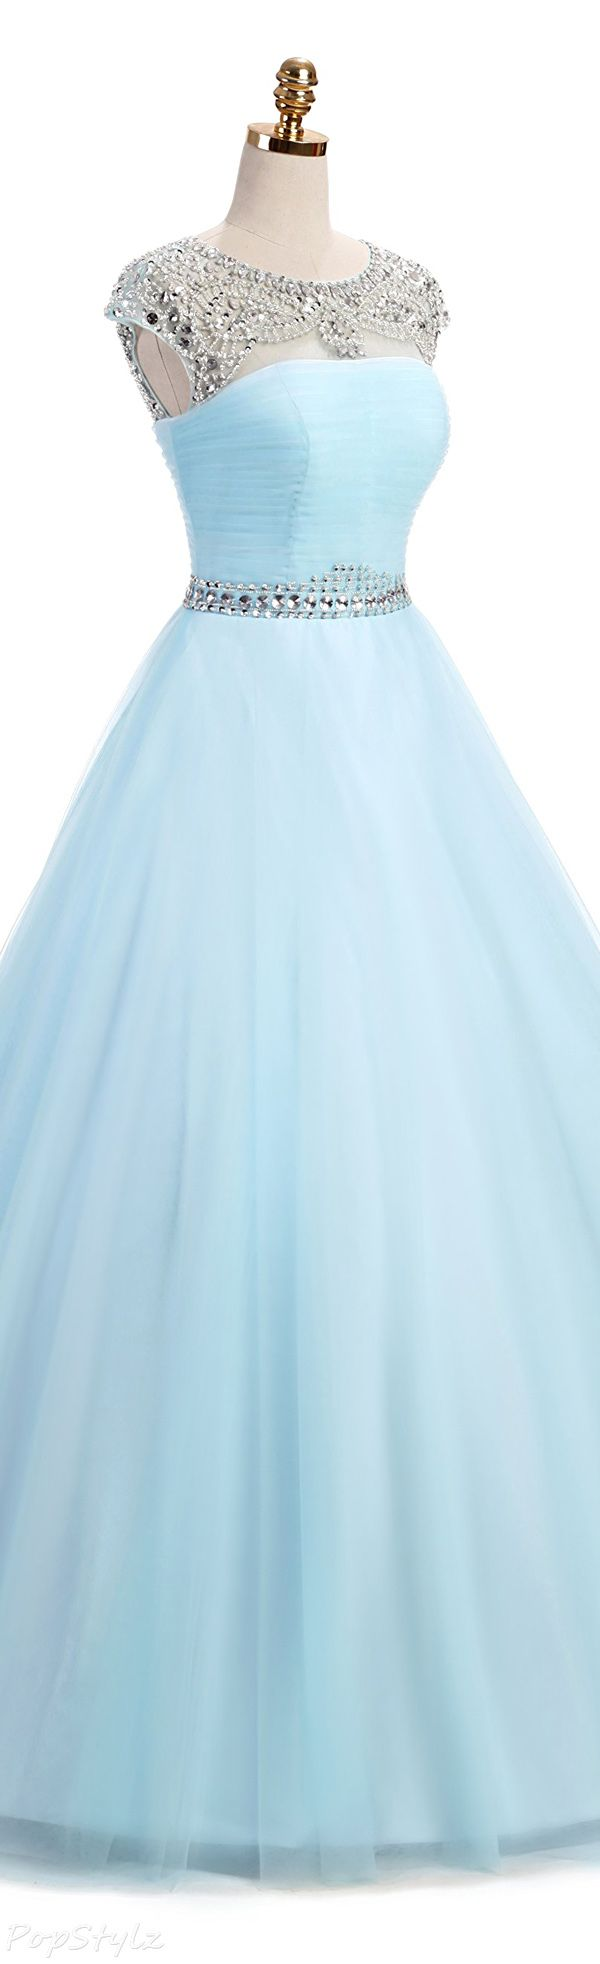 84 best Bridal & Wedding images on Pinterest | Short wedding gowns ...